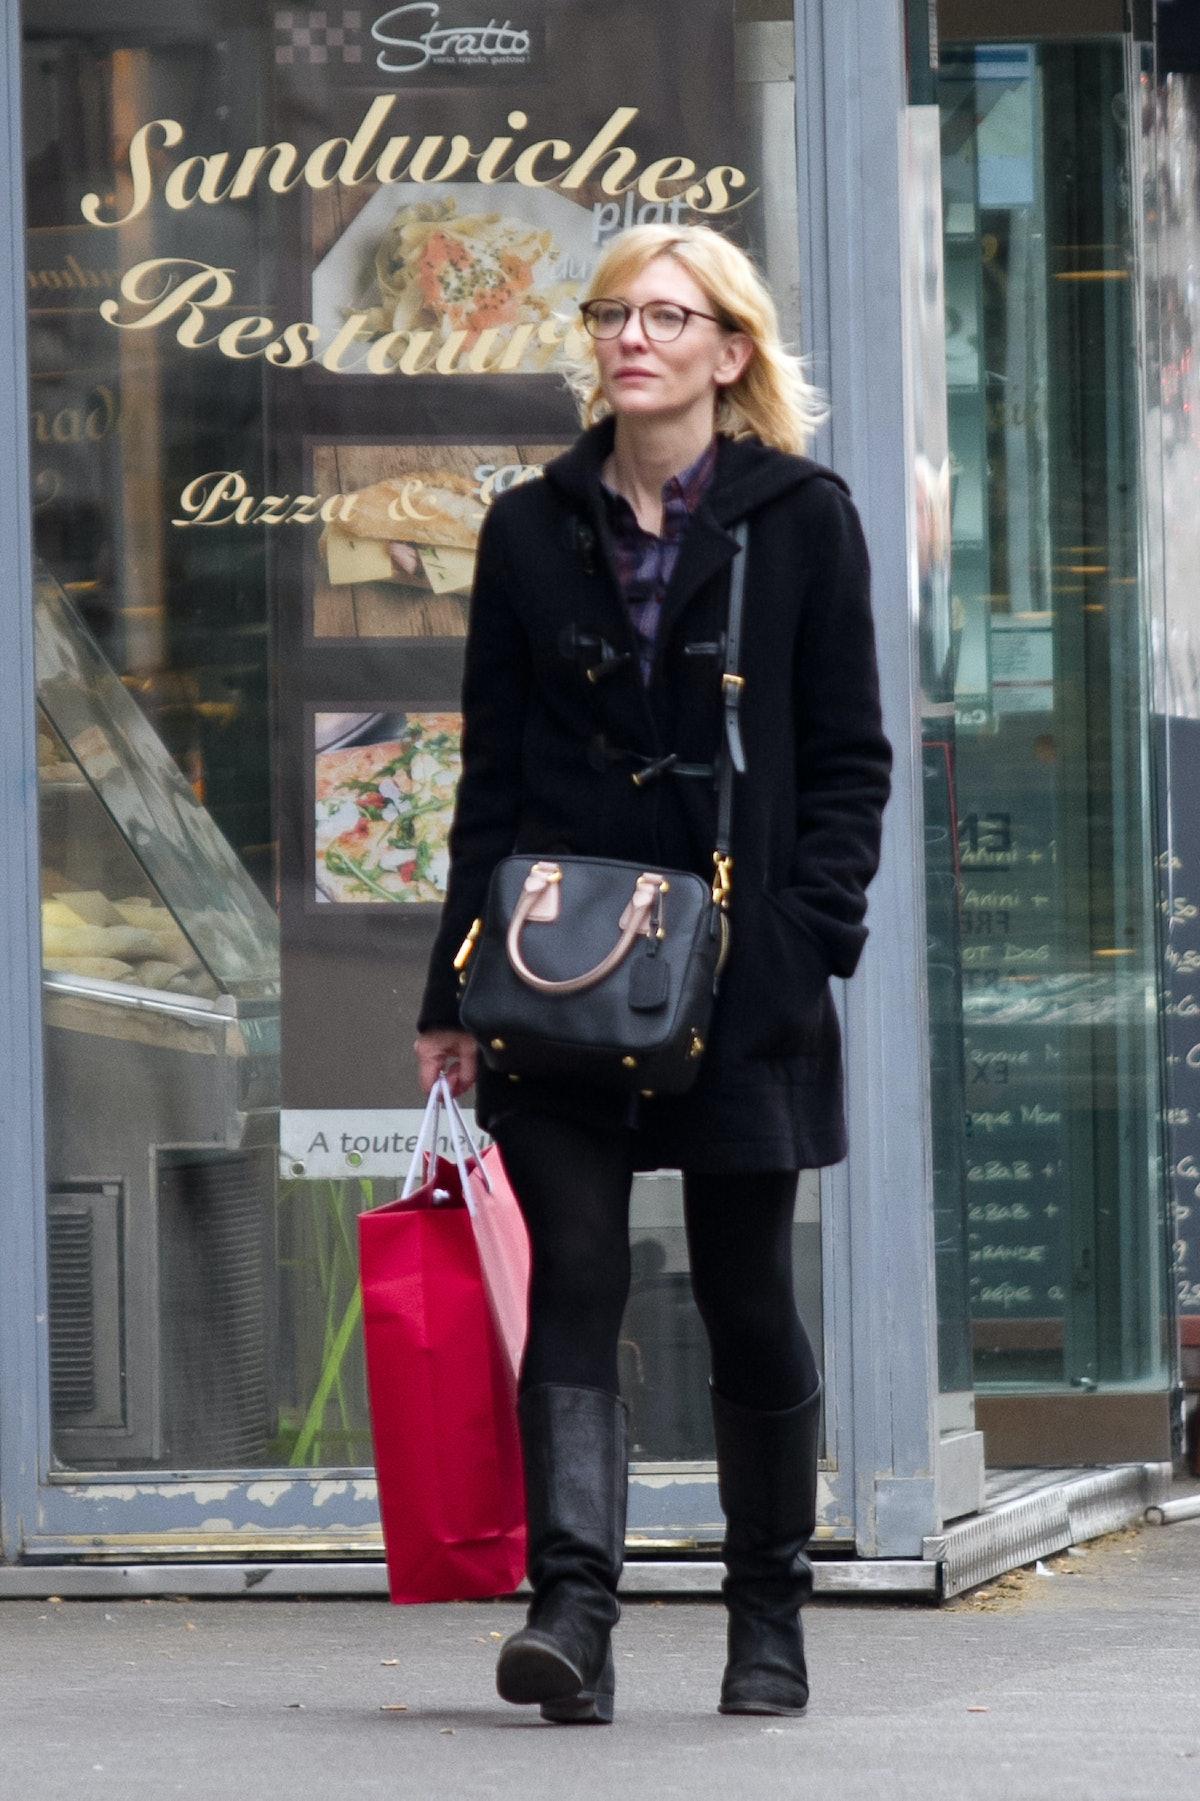 Cate Blanchett Sighting In Paris - April 4, 2012